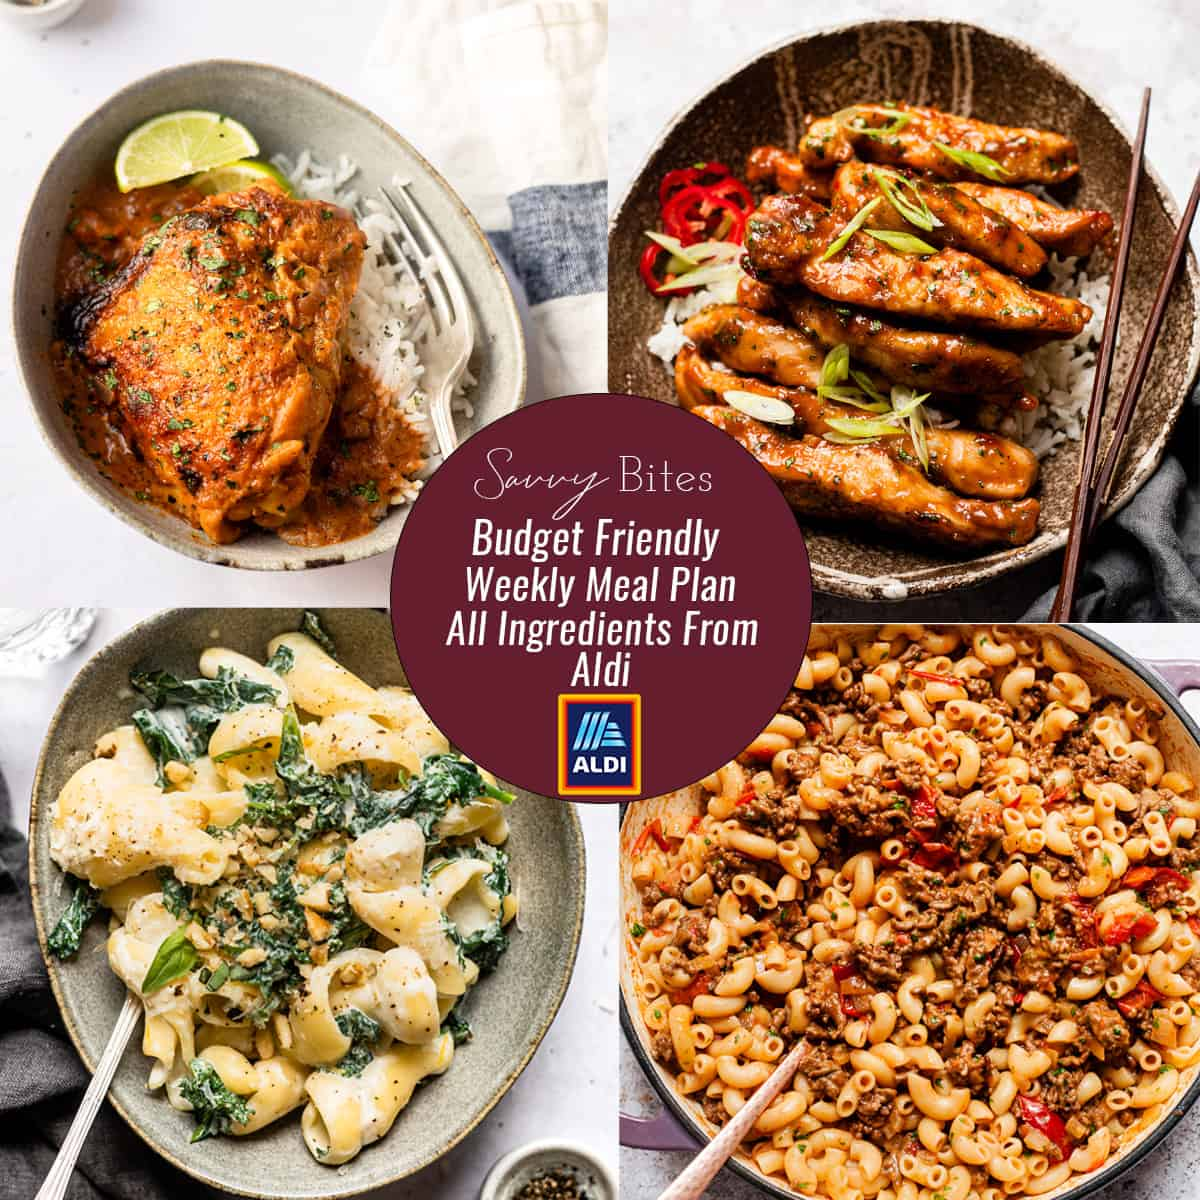 photos of Aldi meal plan recipes